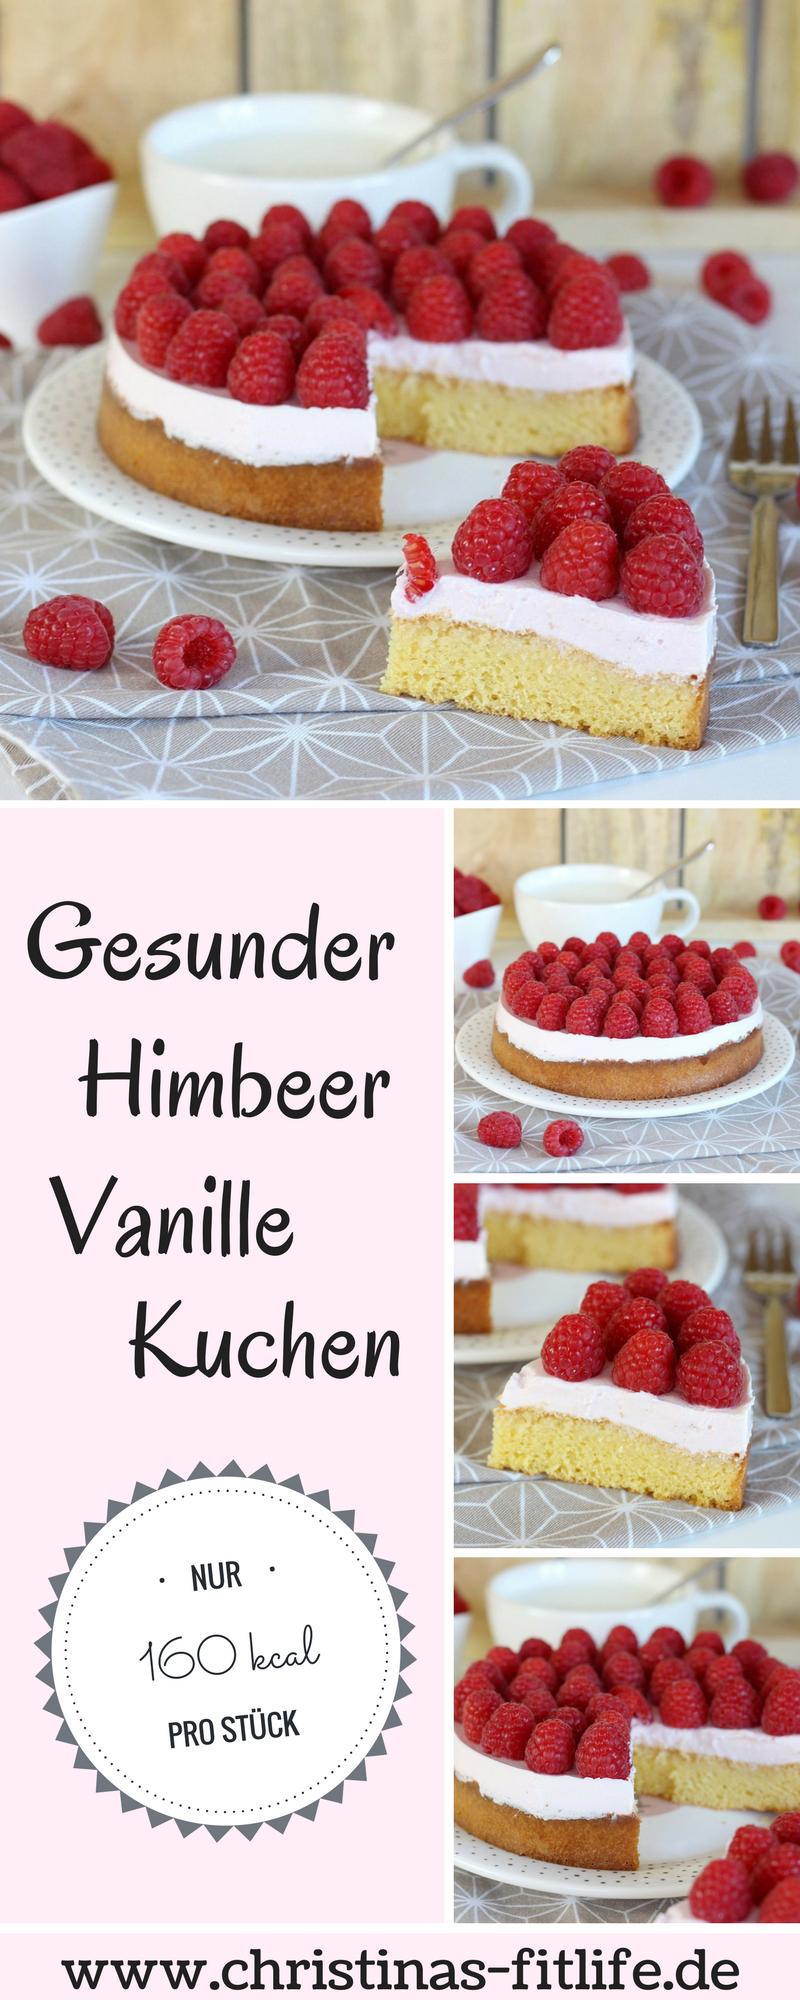 ᐅ Gesunder Himbeer Vanille Kuchen I Rezepte By Christina